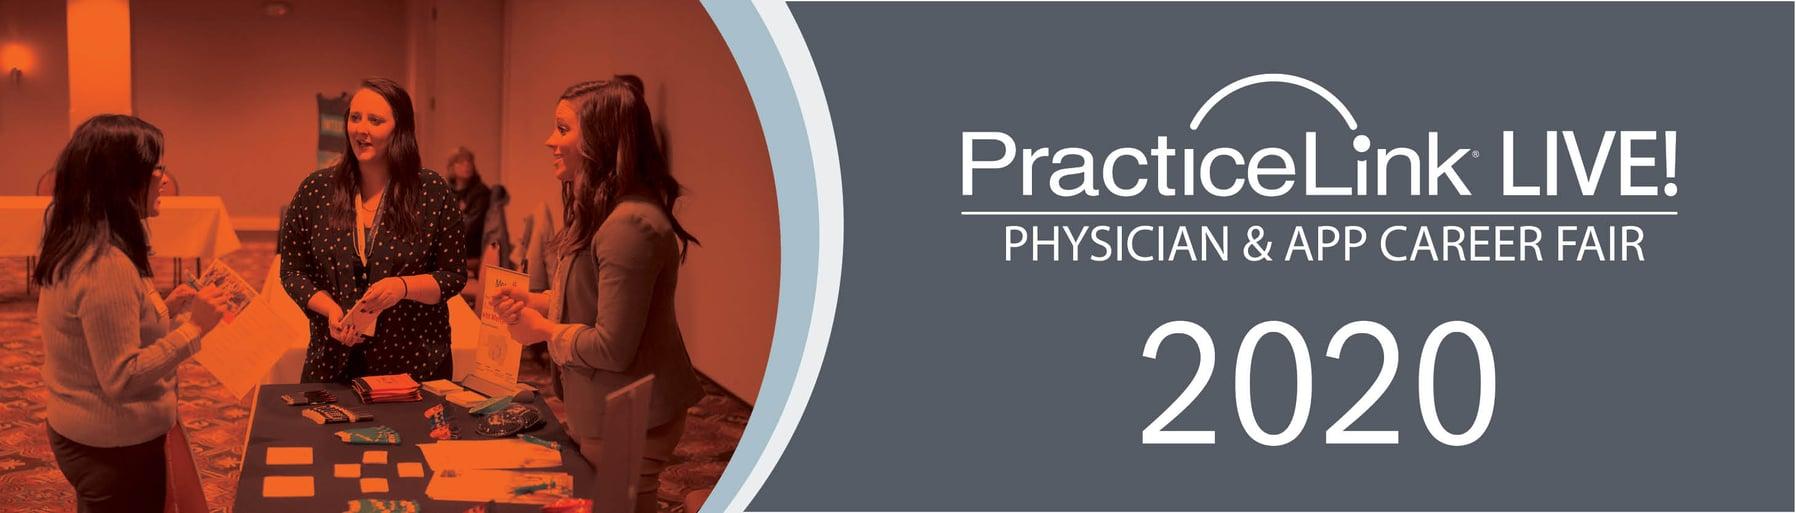 PracticeLink Live Physician and APP Career Fair 2020